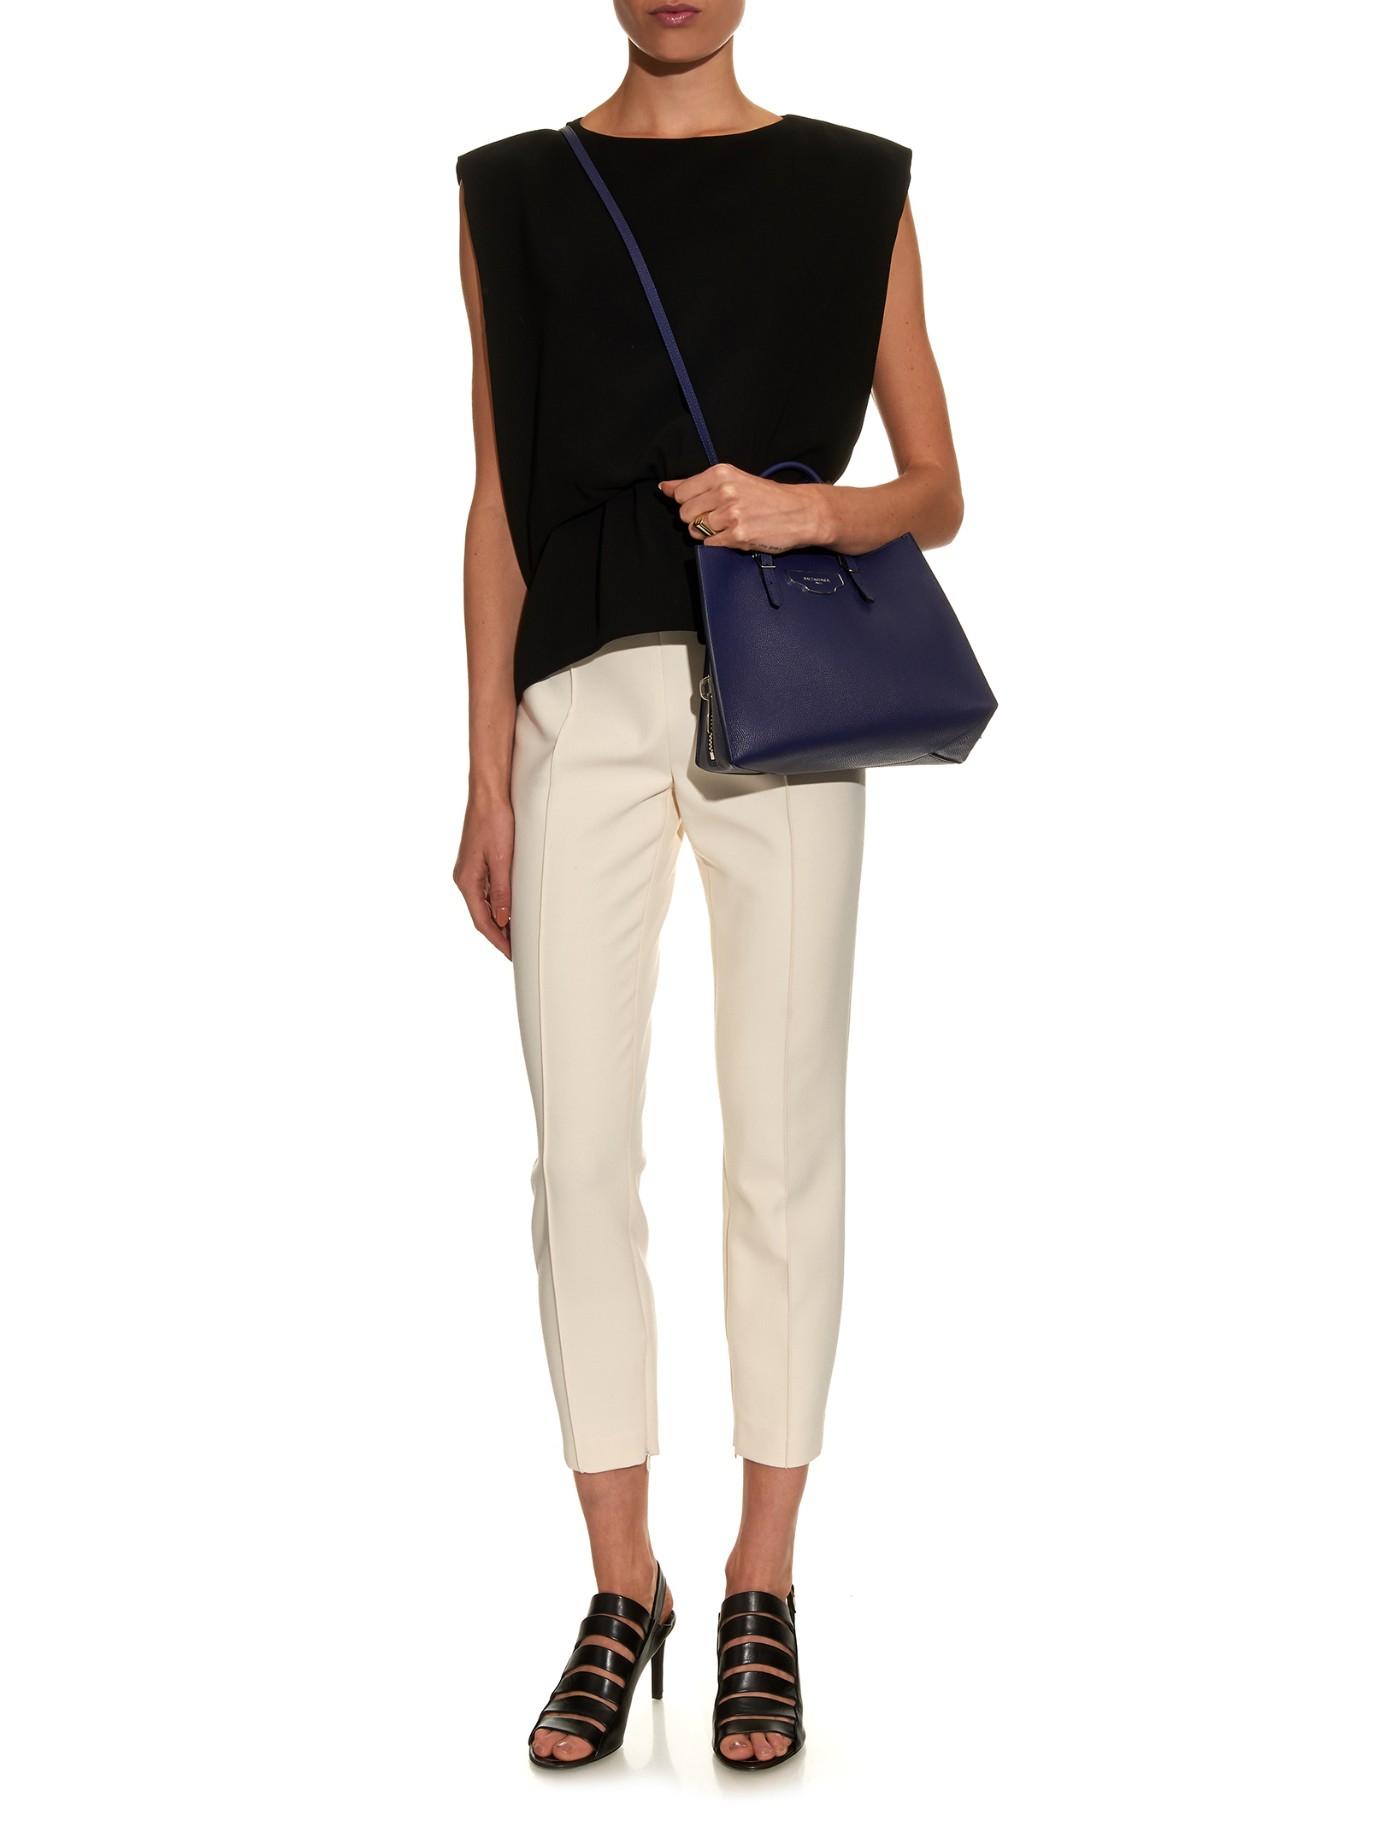 Lyst - Balenciaga Papier A6 Leather Cross-Body Bag in Blue 6216555615060